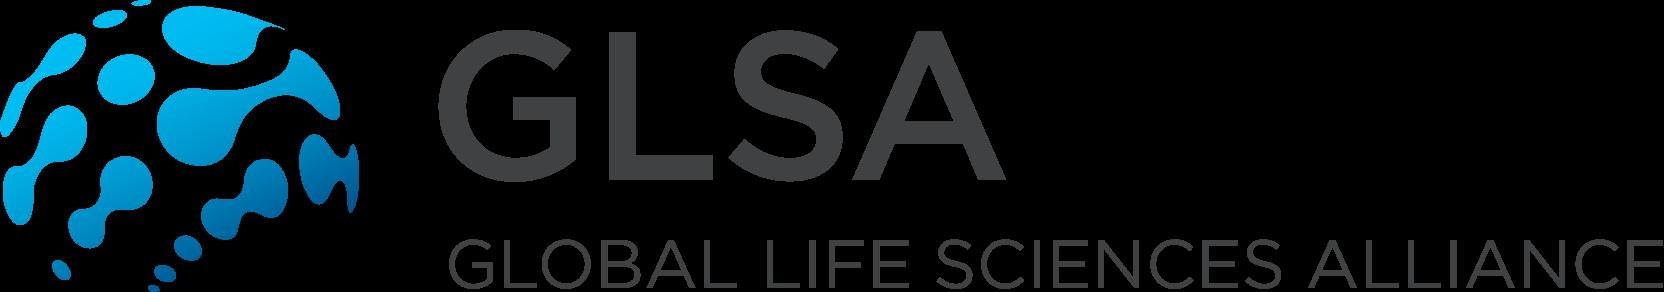 Global Life Sciences Alliance Logo